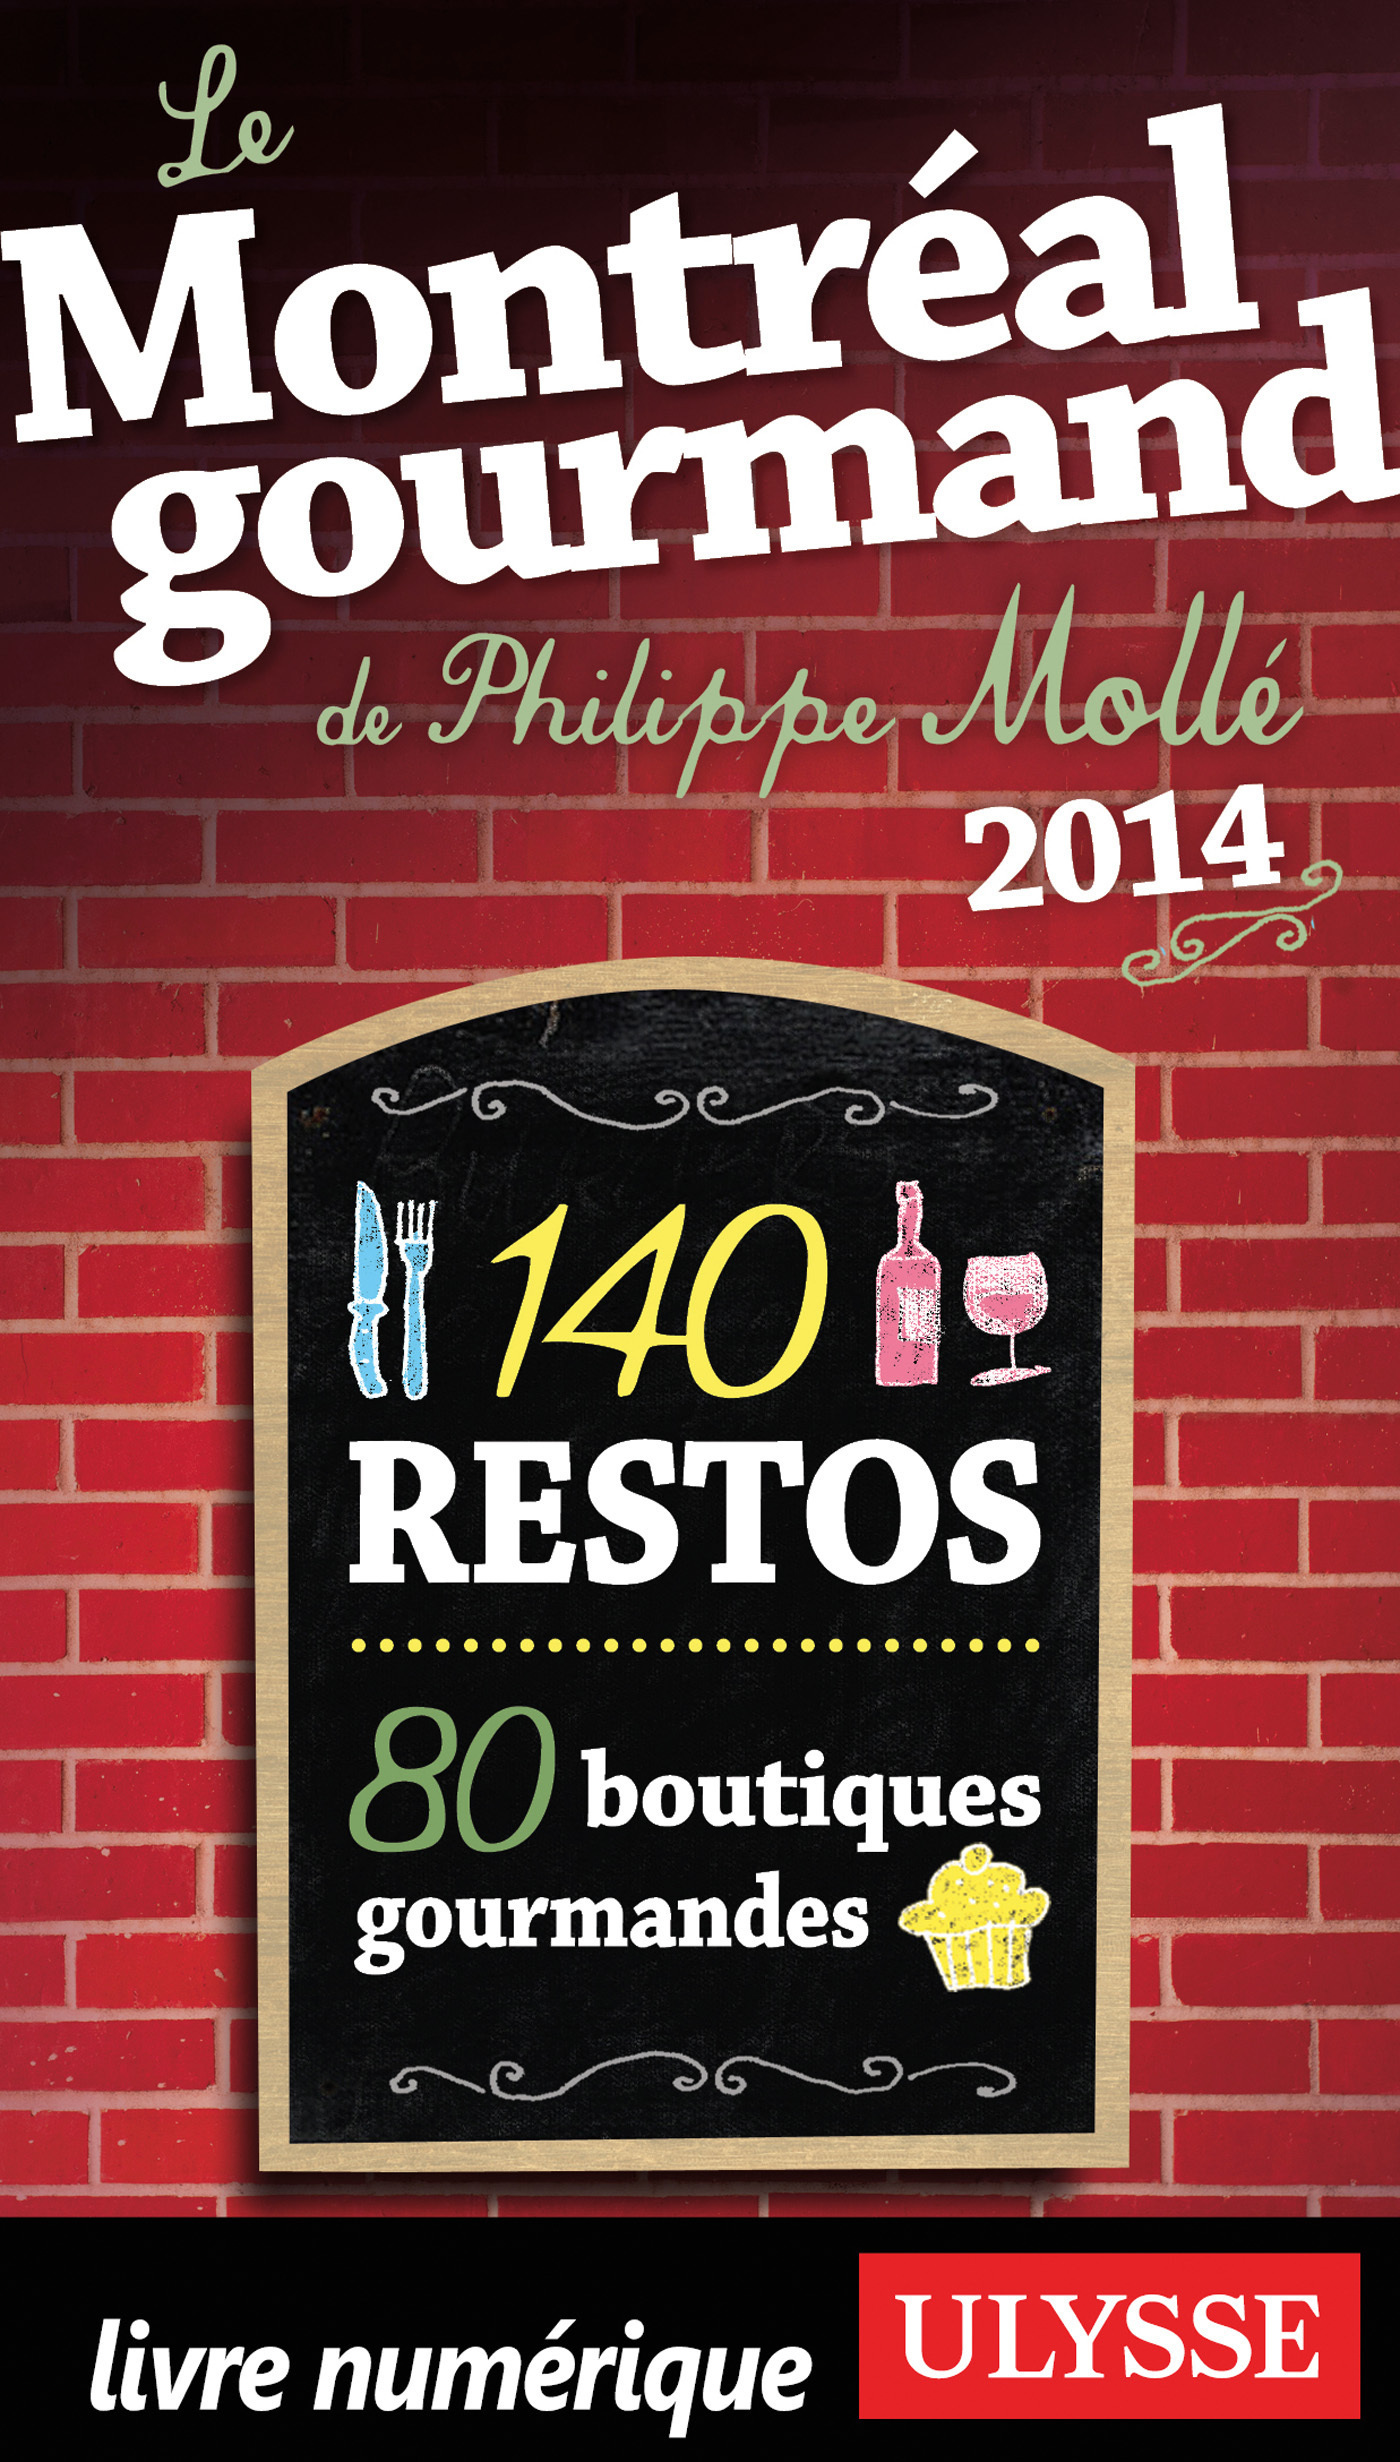 Le Montréal gourmand de Philippe Mollé 2014 (ebook)